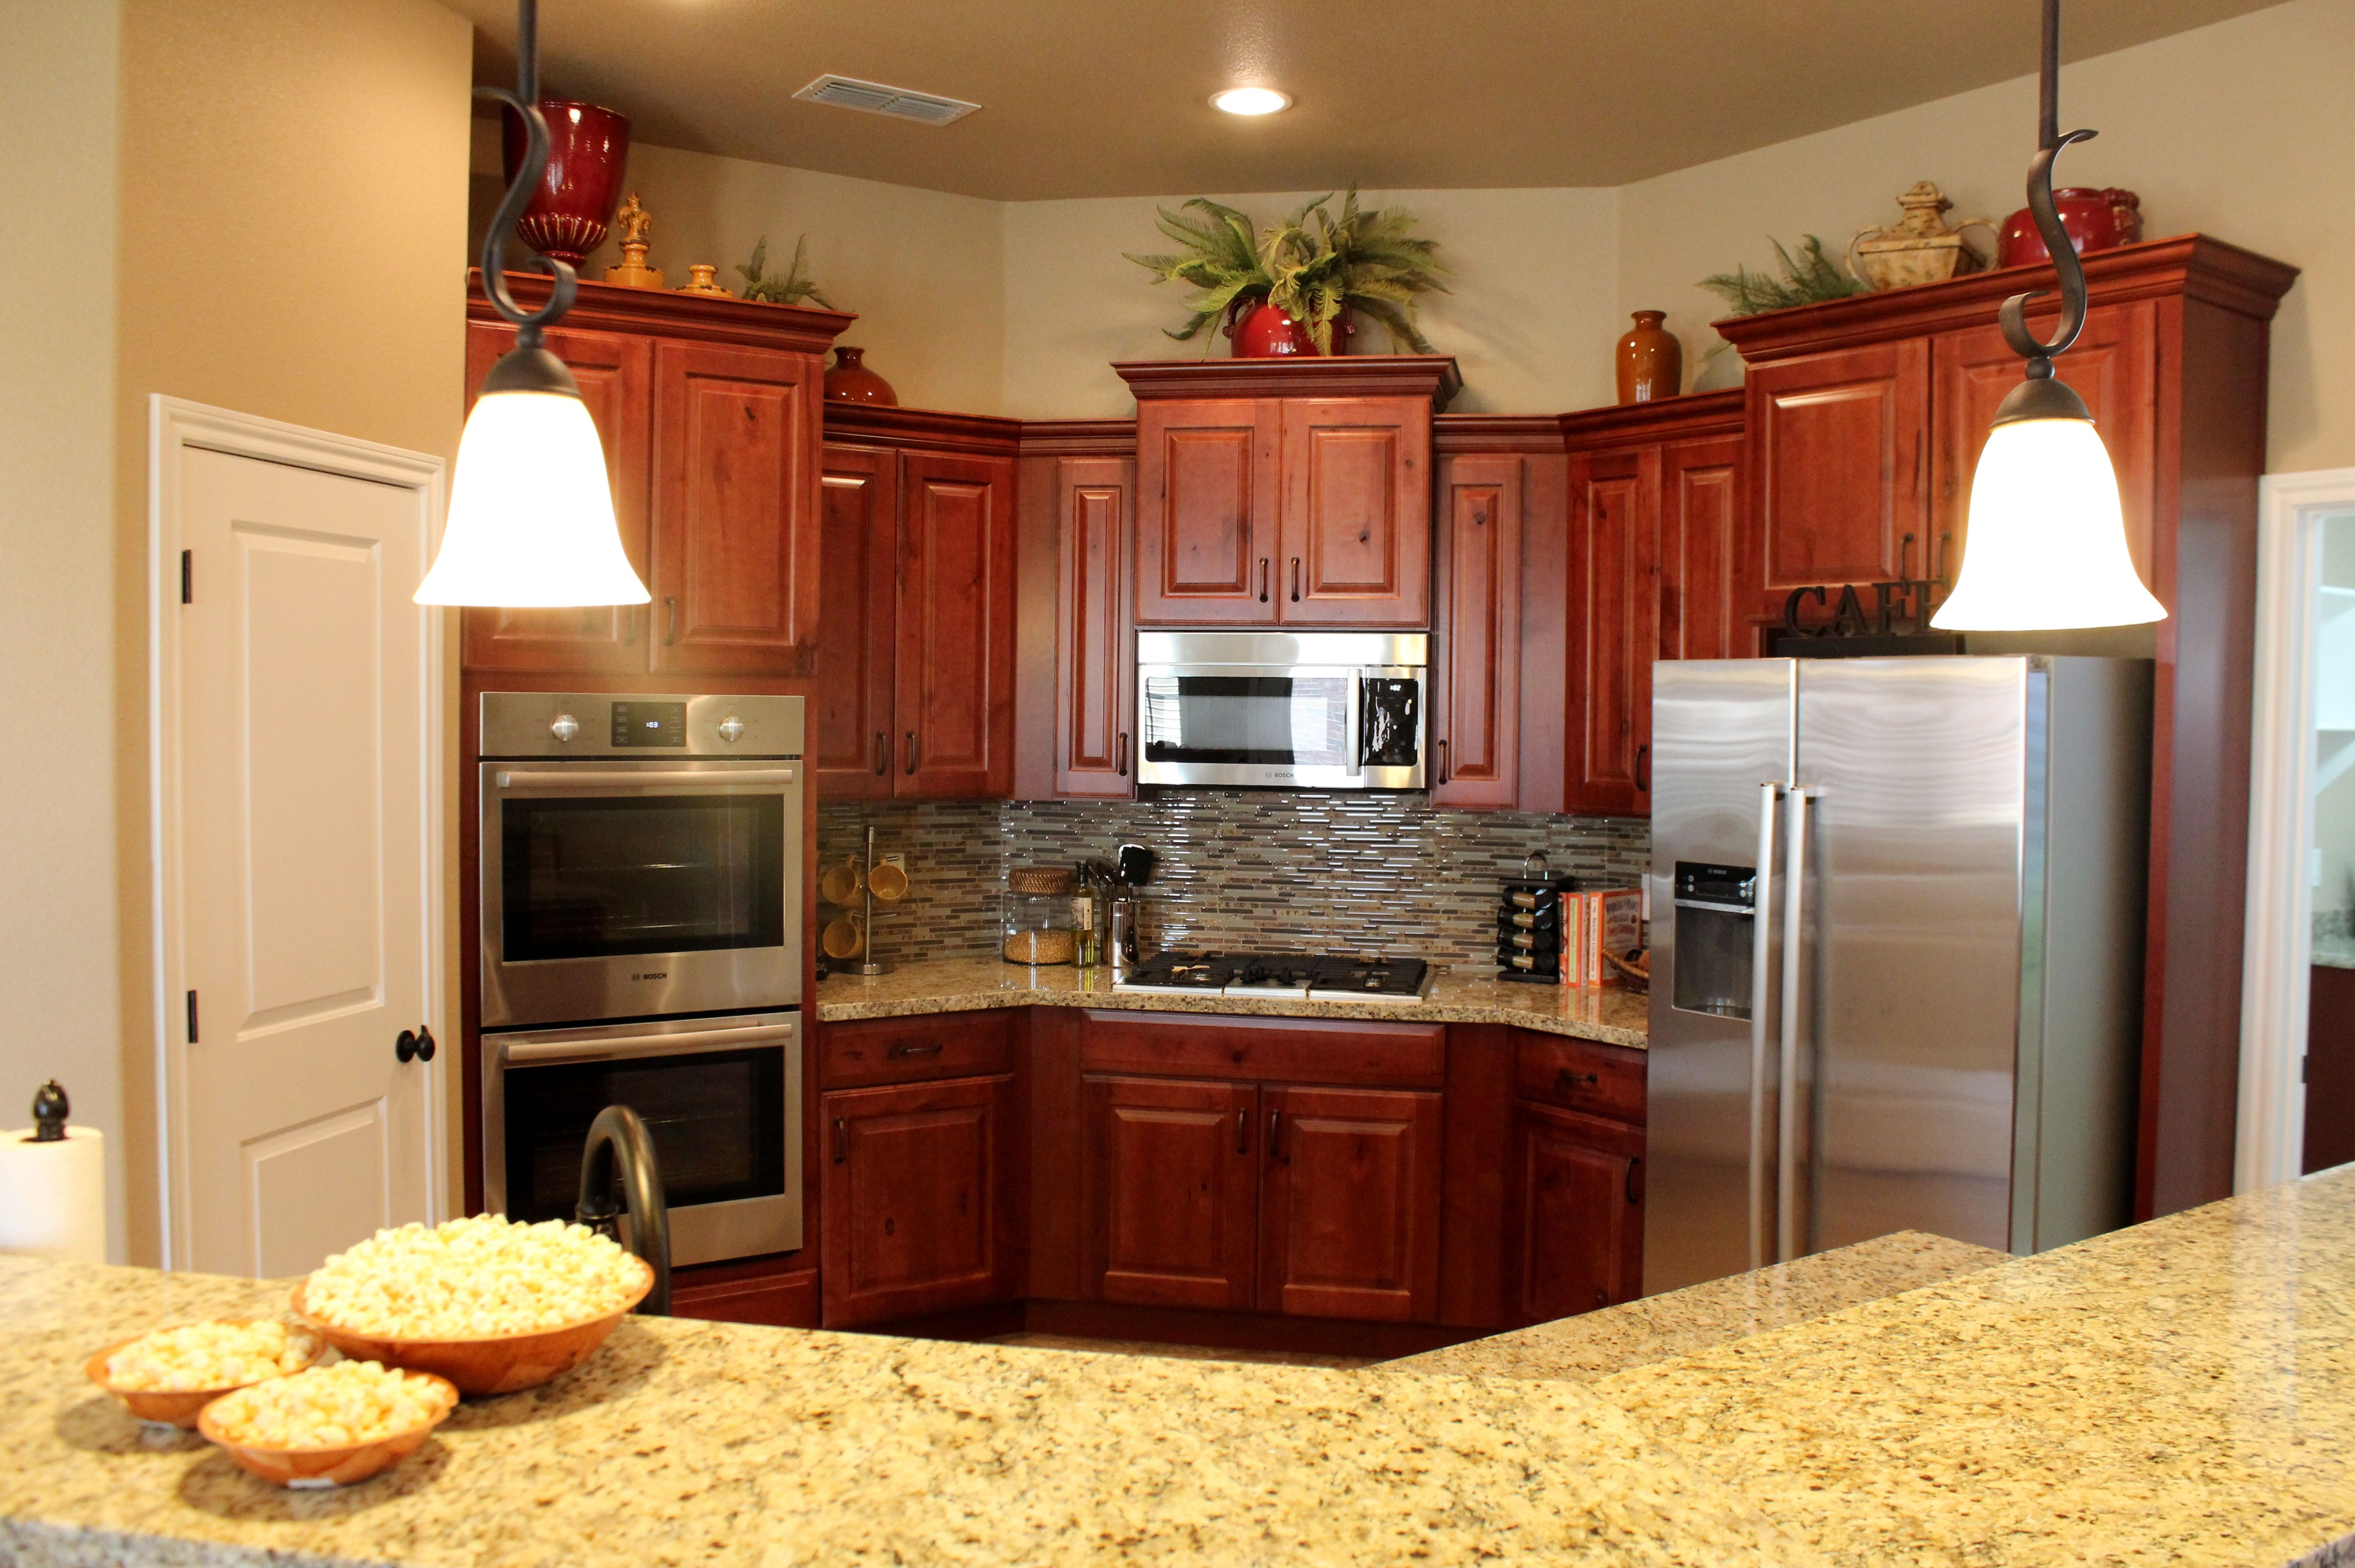 New Venetian Gold Granite Rustic Maple Cabinets In